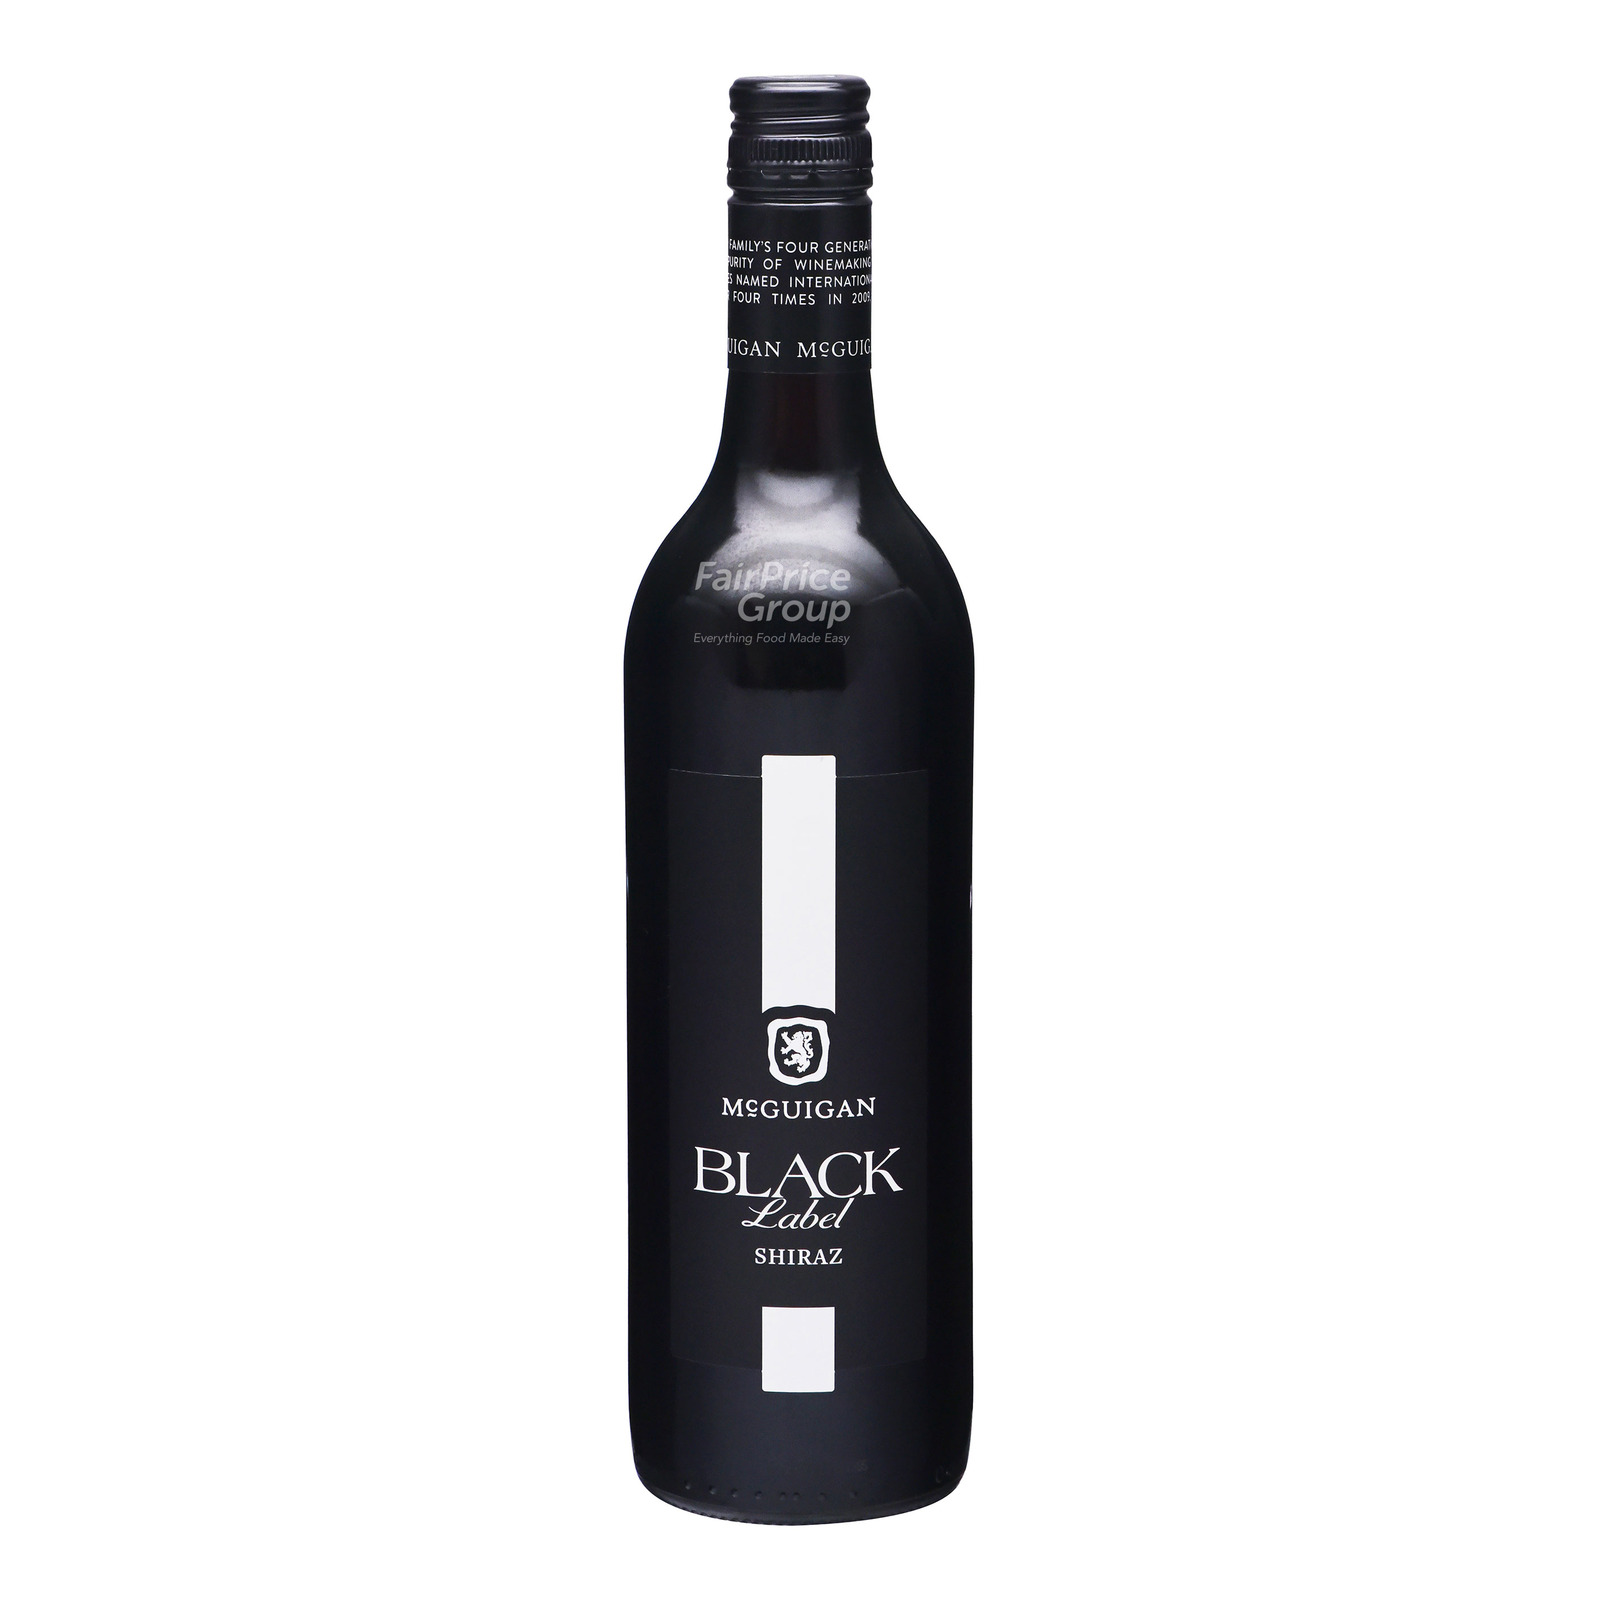 McGuigan Black Label Red Wine - Shiraz